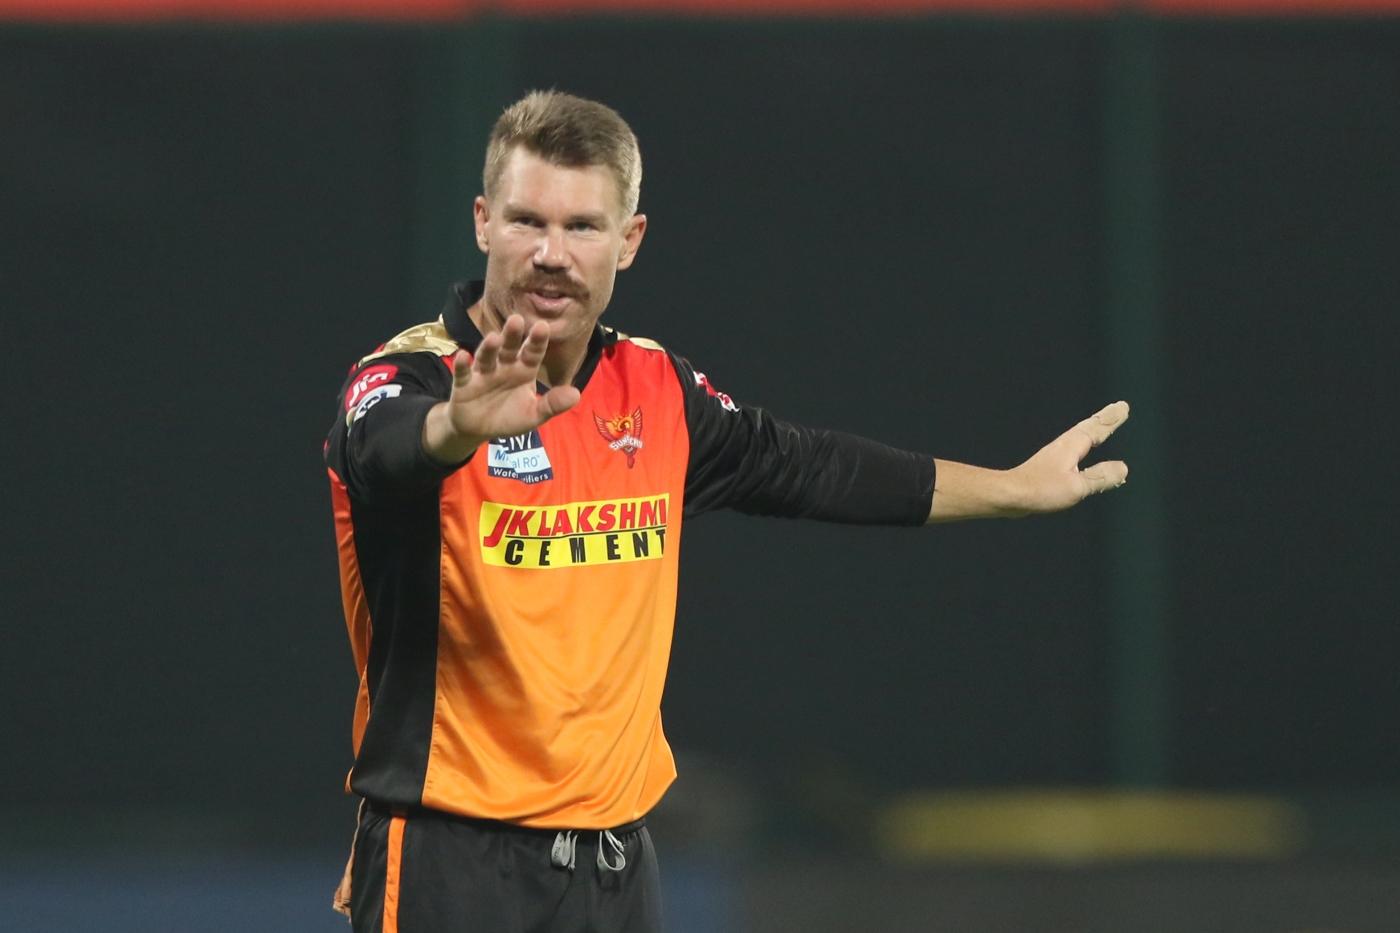 IPL 2021: Sanjay Manjrekar names possible replacement for David Warner in SRH Squad